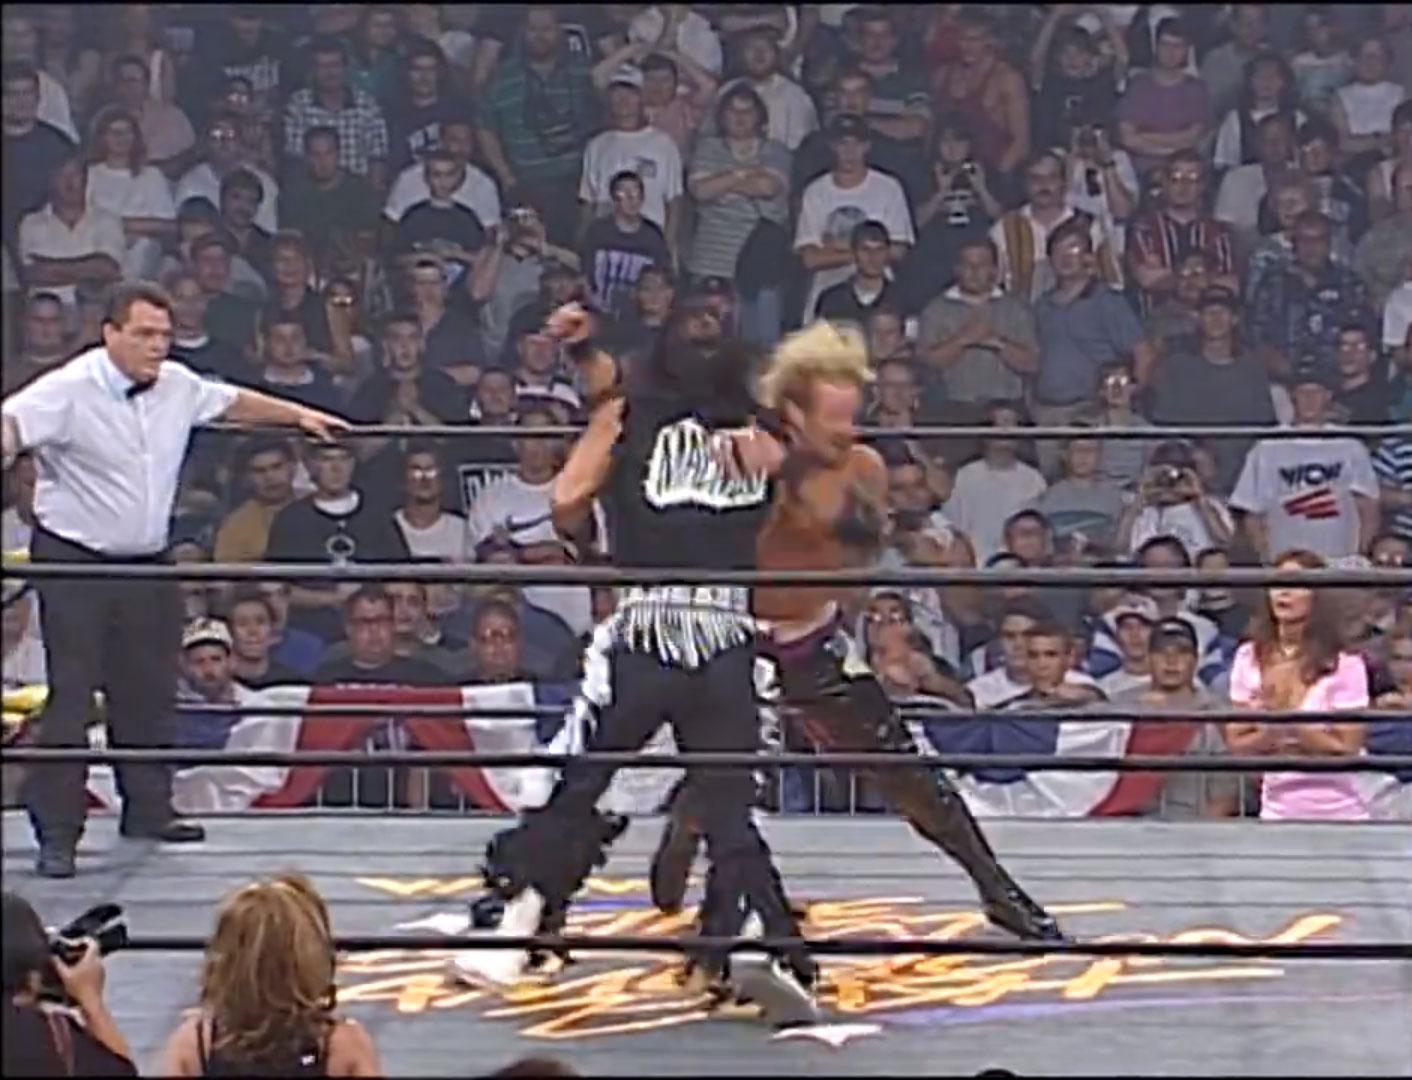 Randy Savage vs. Diamond Dallas Page Falls Count Anywhere WCW Great American Bash '97, Jun 15th 1997